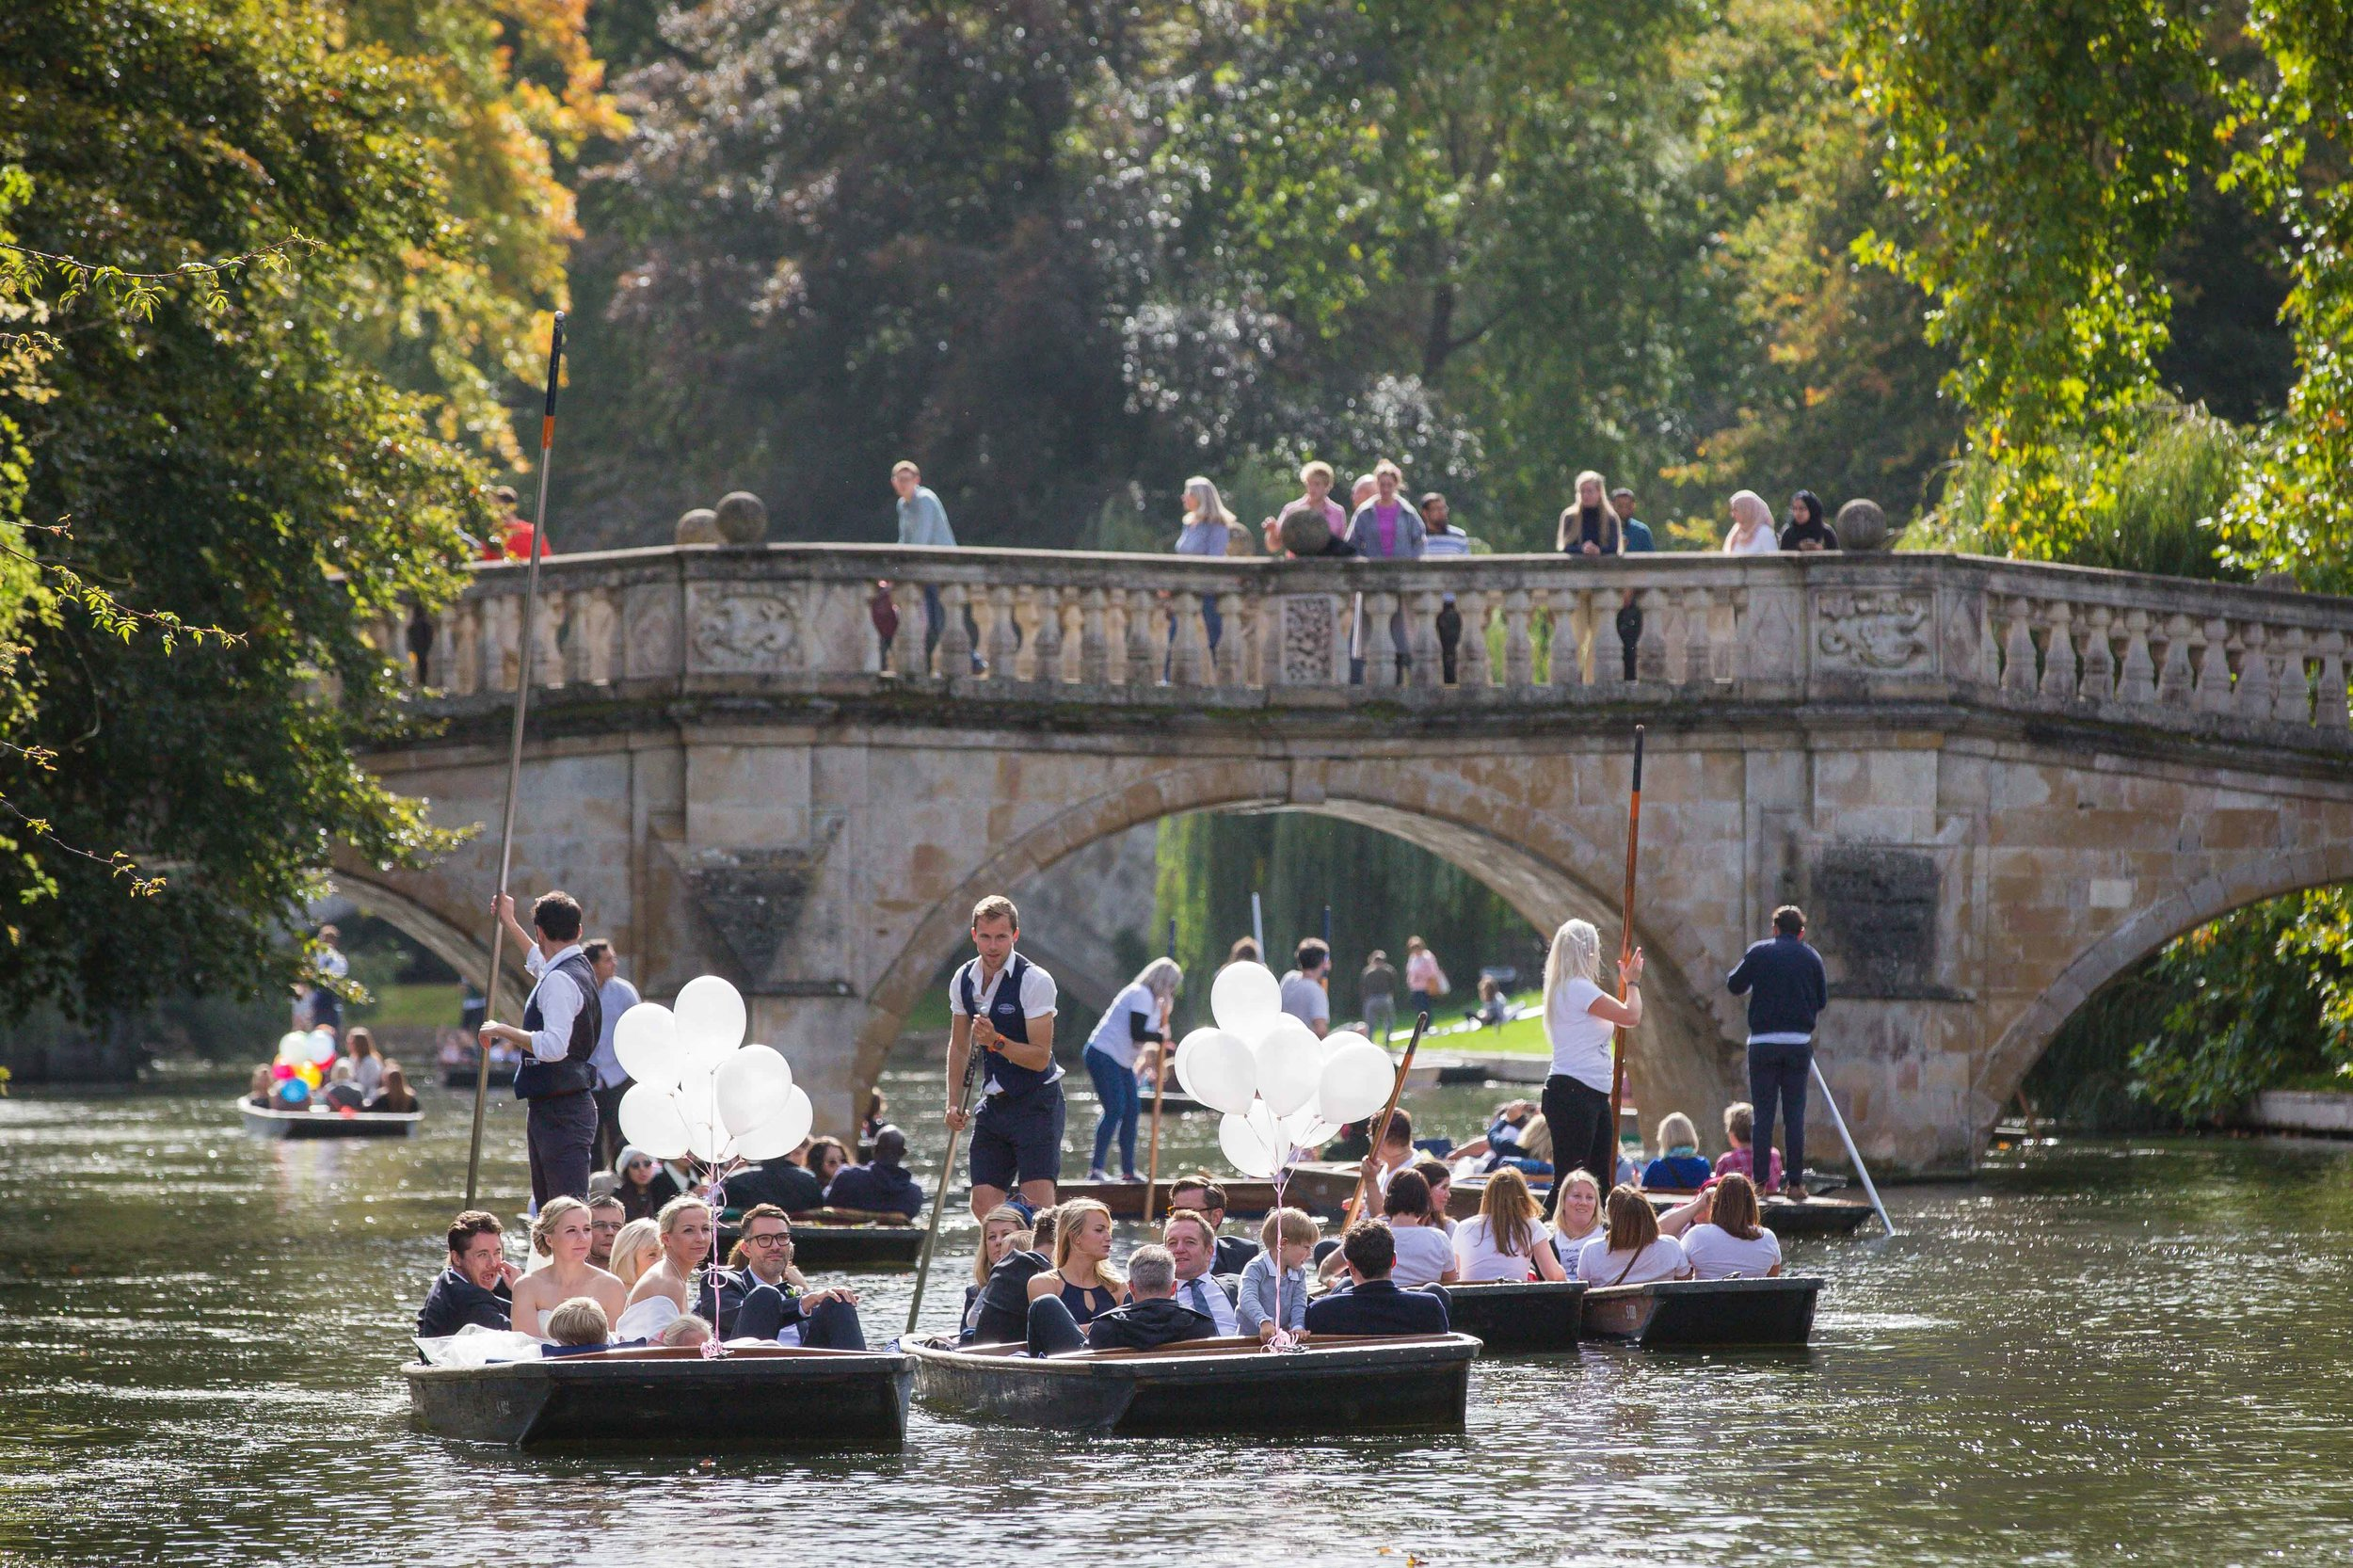 Adrian_Nicole_Charnwood_Weddings_Queens_College_Cambridge-1047.jpg